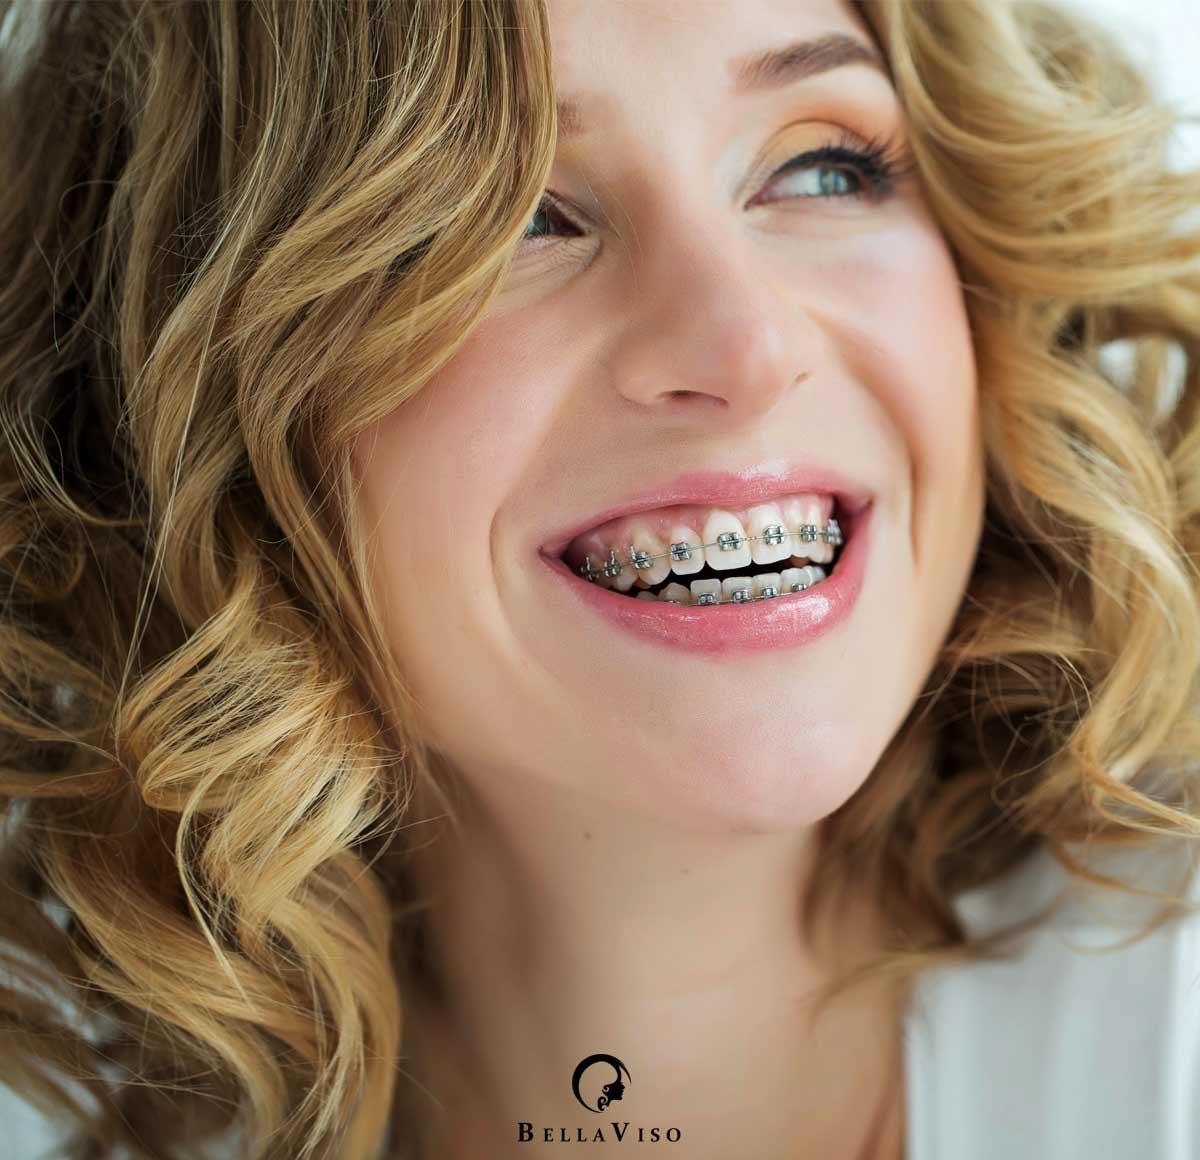 Dental Braces The Procedure